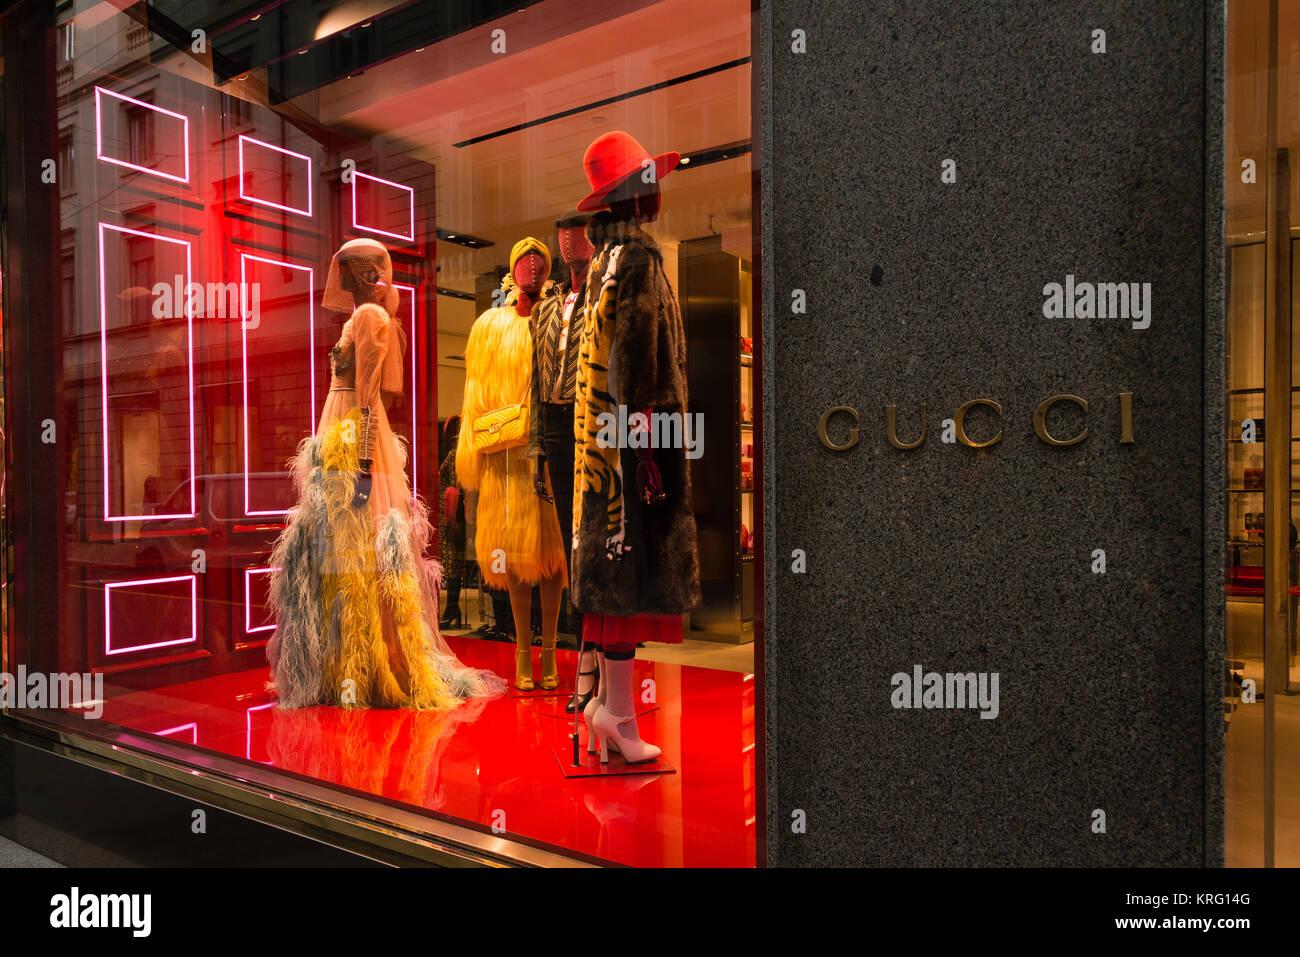 A Gucci Shop In A Mall Imágenes De Stock   A Gucci Shop In A Mall ... 83d3aeab99a